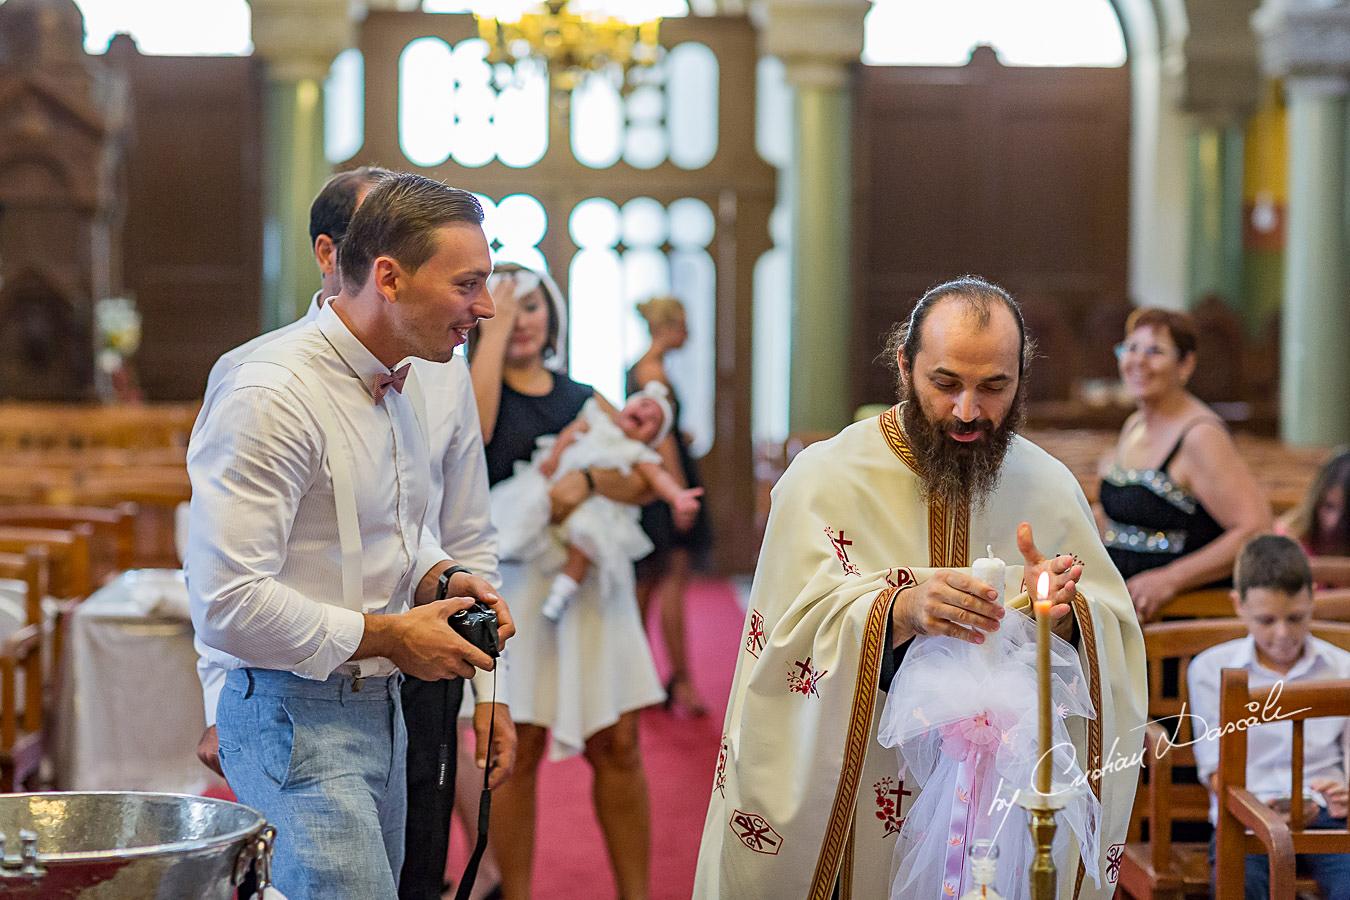 Angelic Christening in Limassol - 30